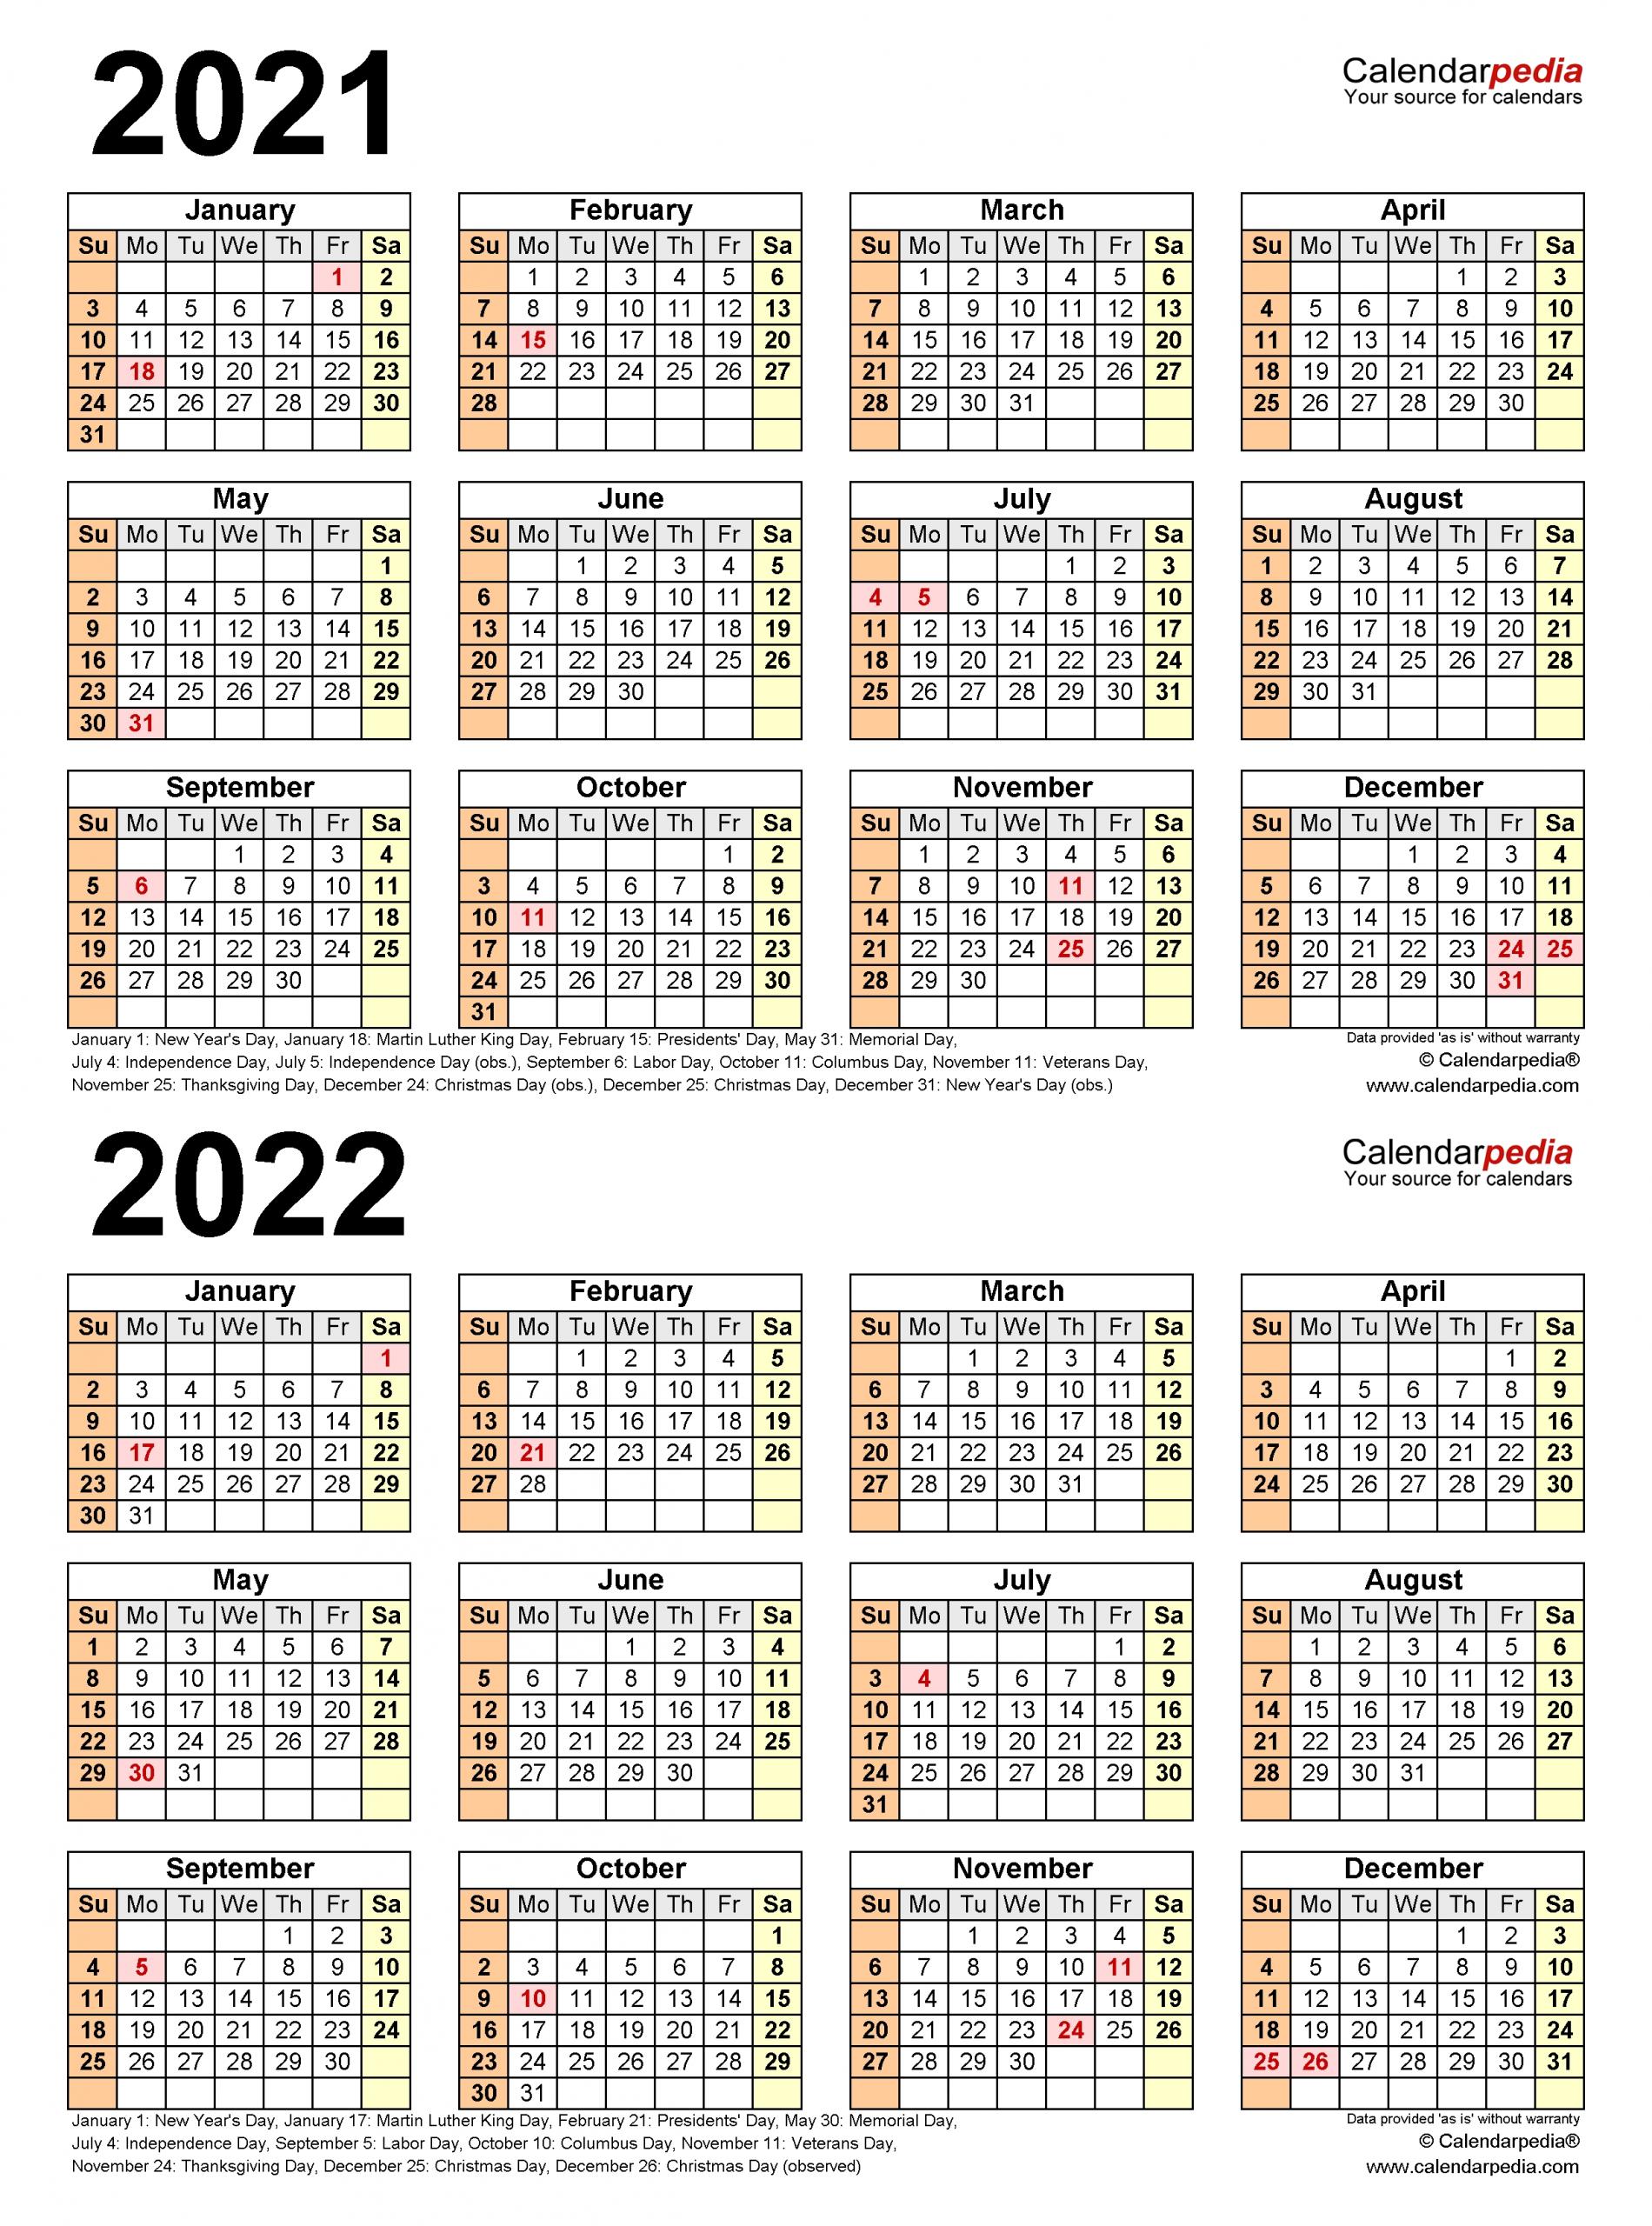 Take 3 Year Calendar Printable 2021 2021 2022